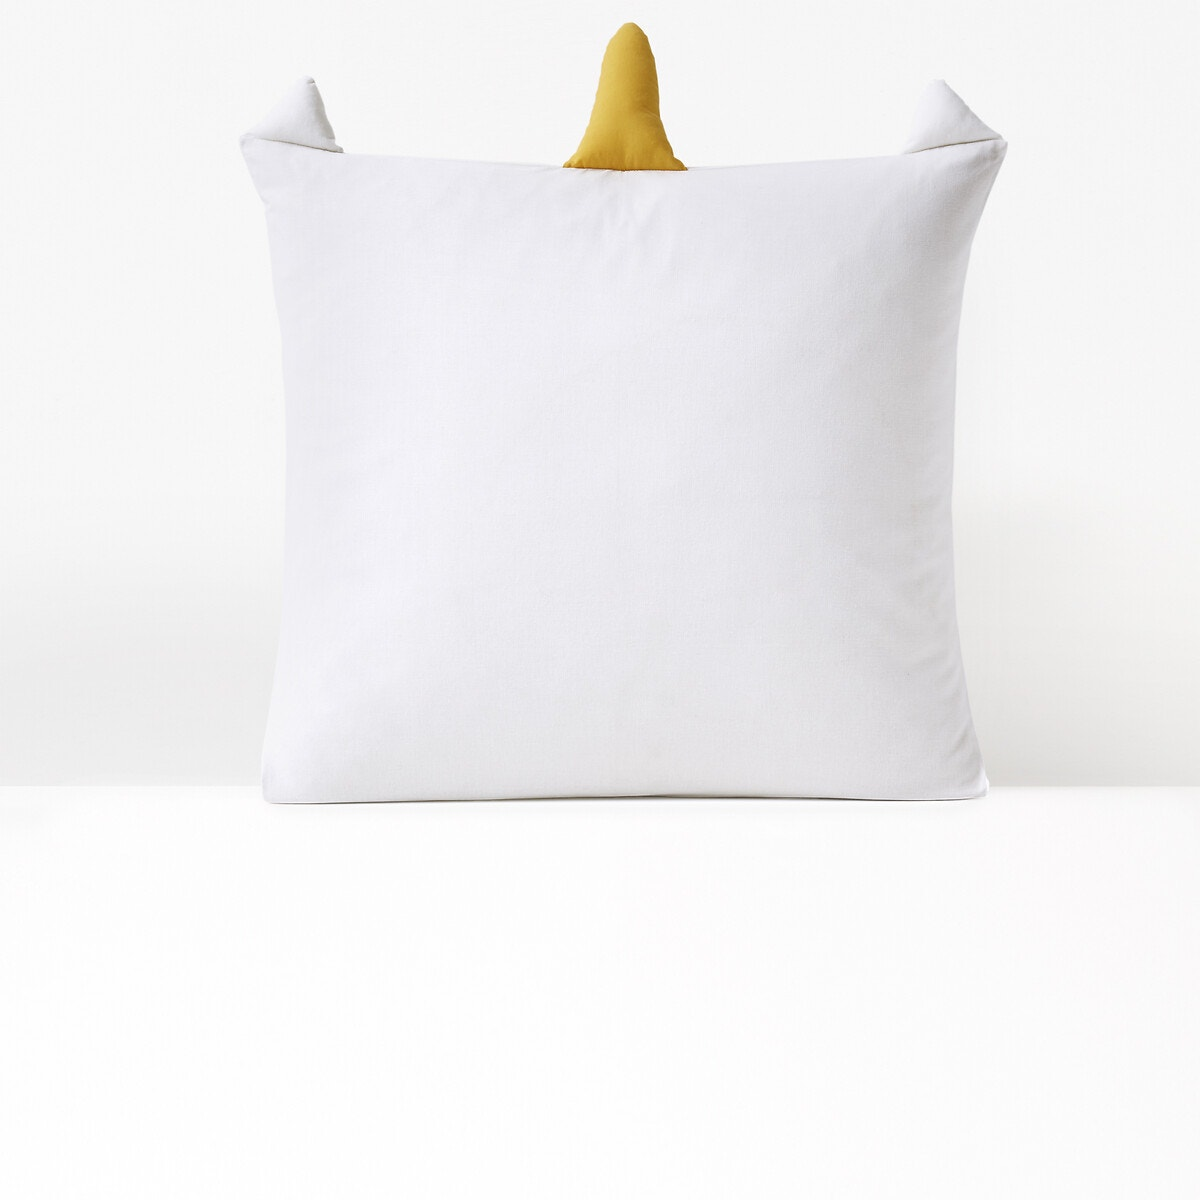 Petula オーガニックコットン 枕カバー